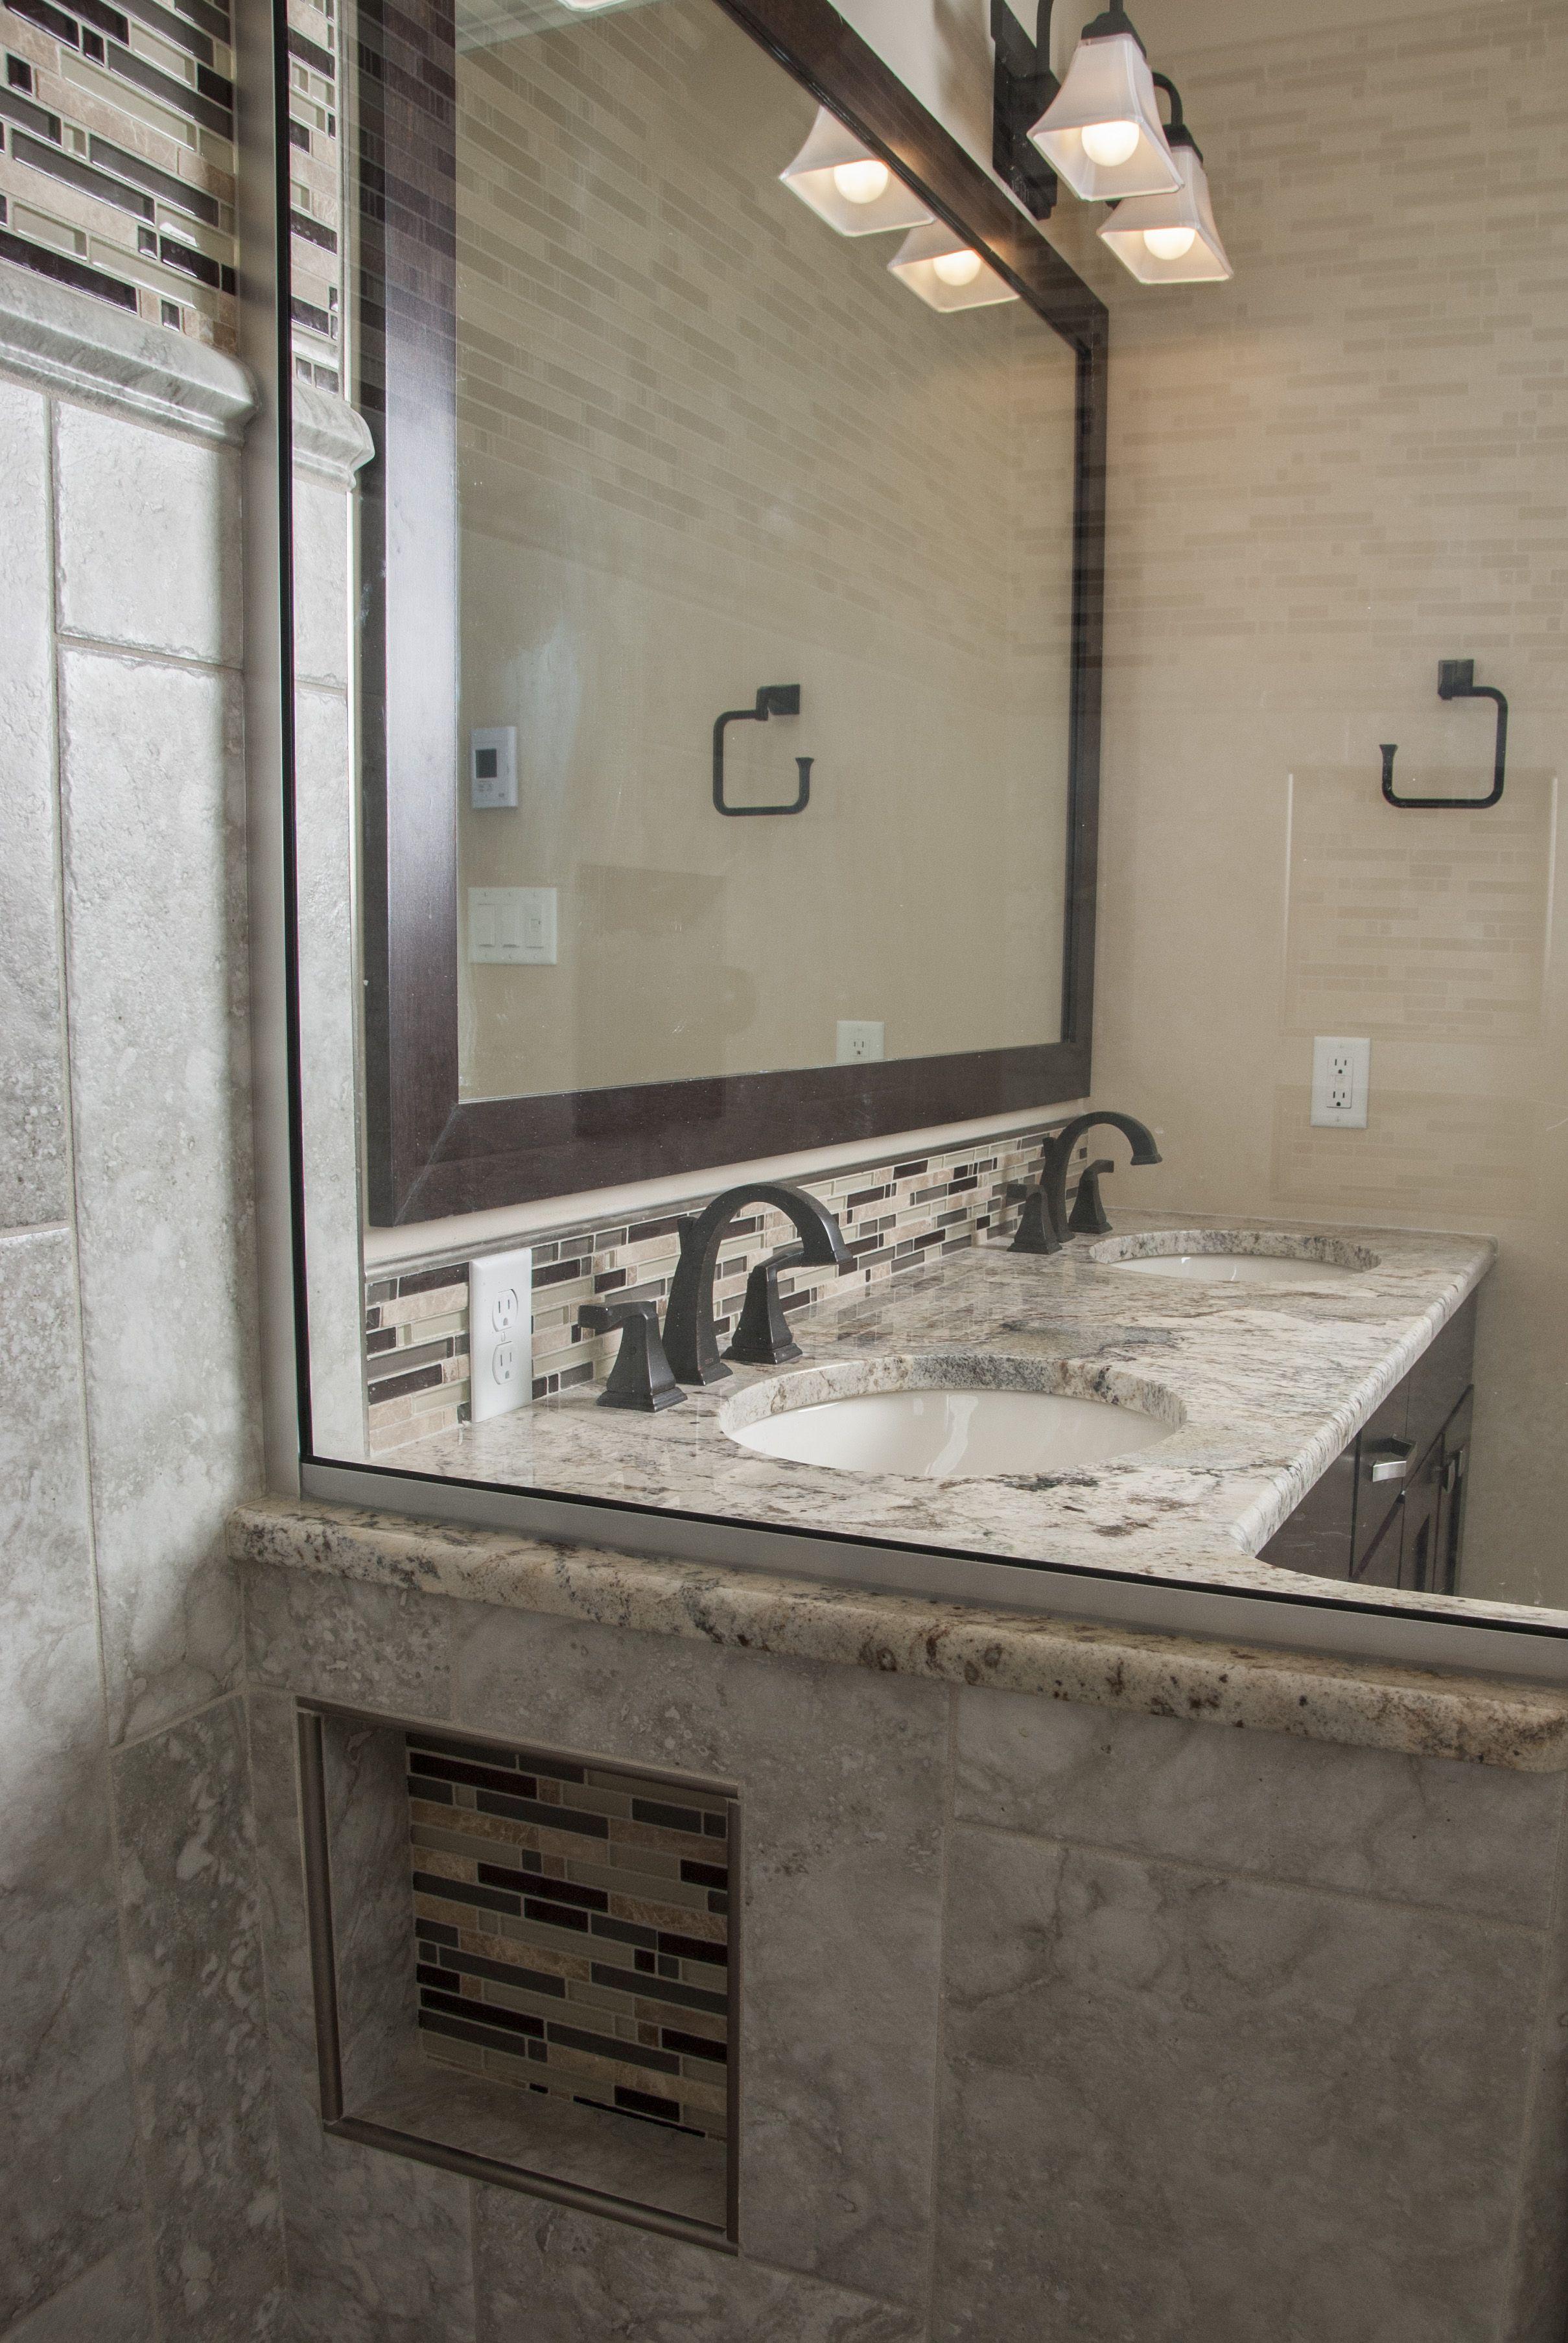 glass shower custom vanity granite countertop espresso mirror frame mosaic tiles hidden niche shower niche oil rubbed bronze faucets